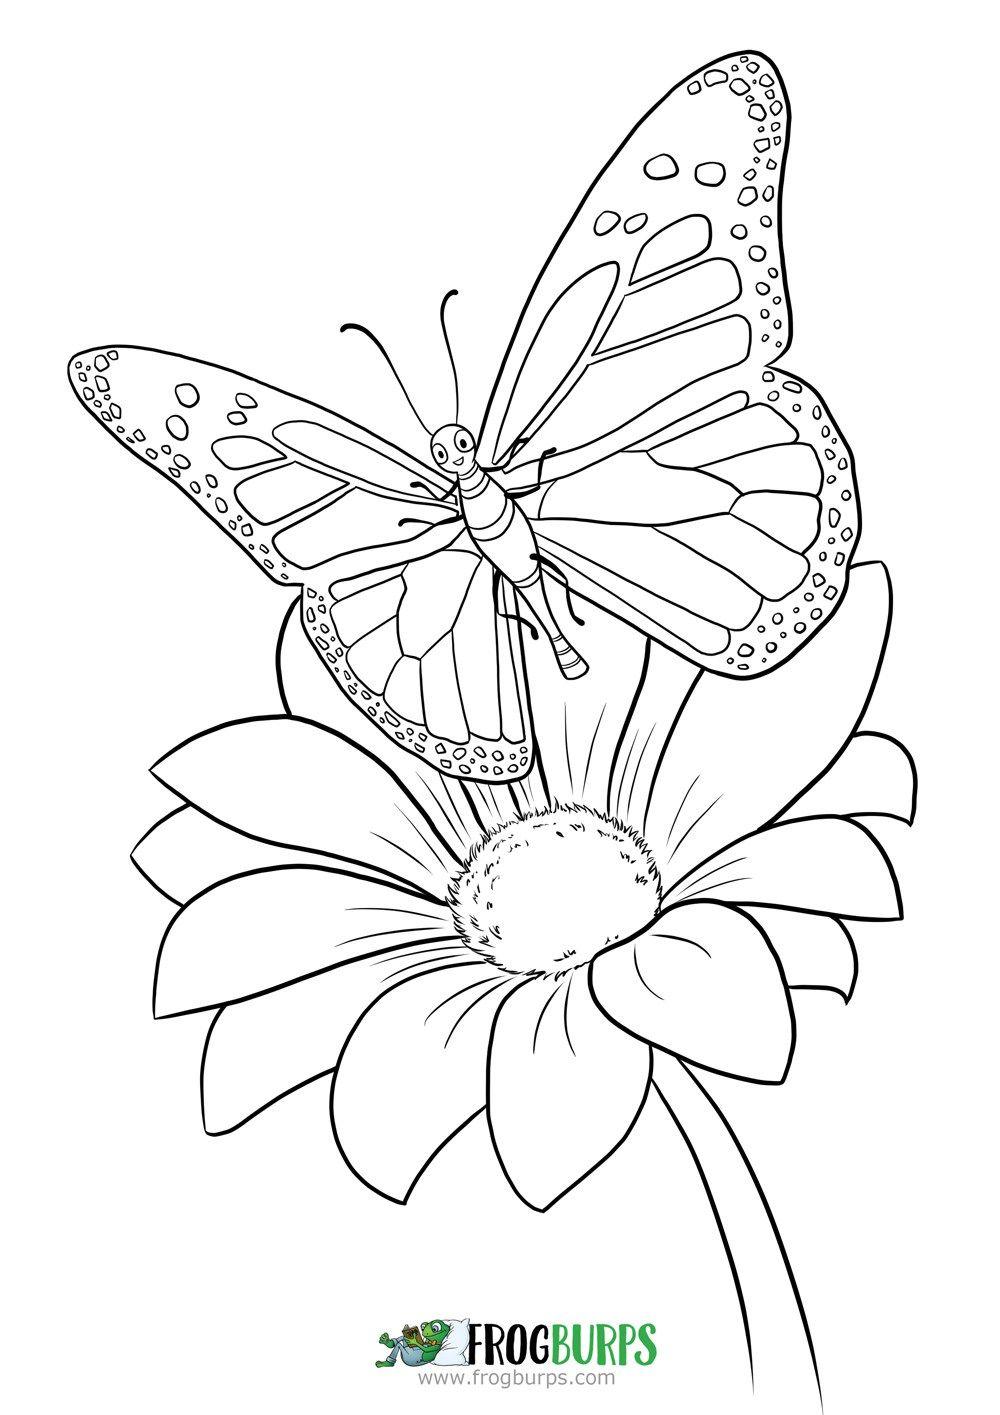 Butterfly Coloring Page Butterfly Coloring Page Coloring Pages Flower Coloring Pages [ 1415 x 1000 Pixel ]